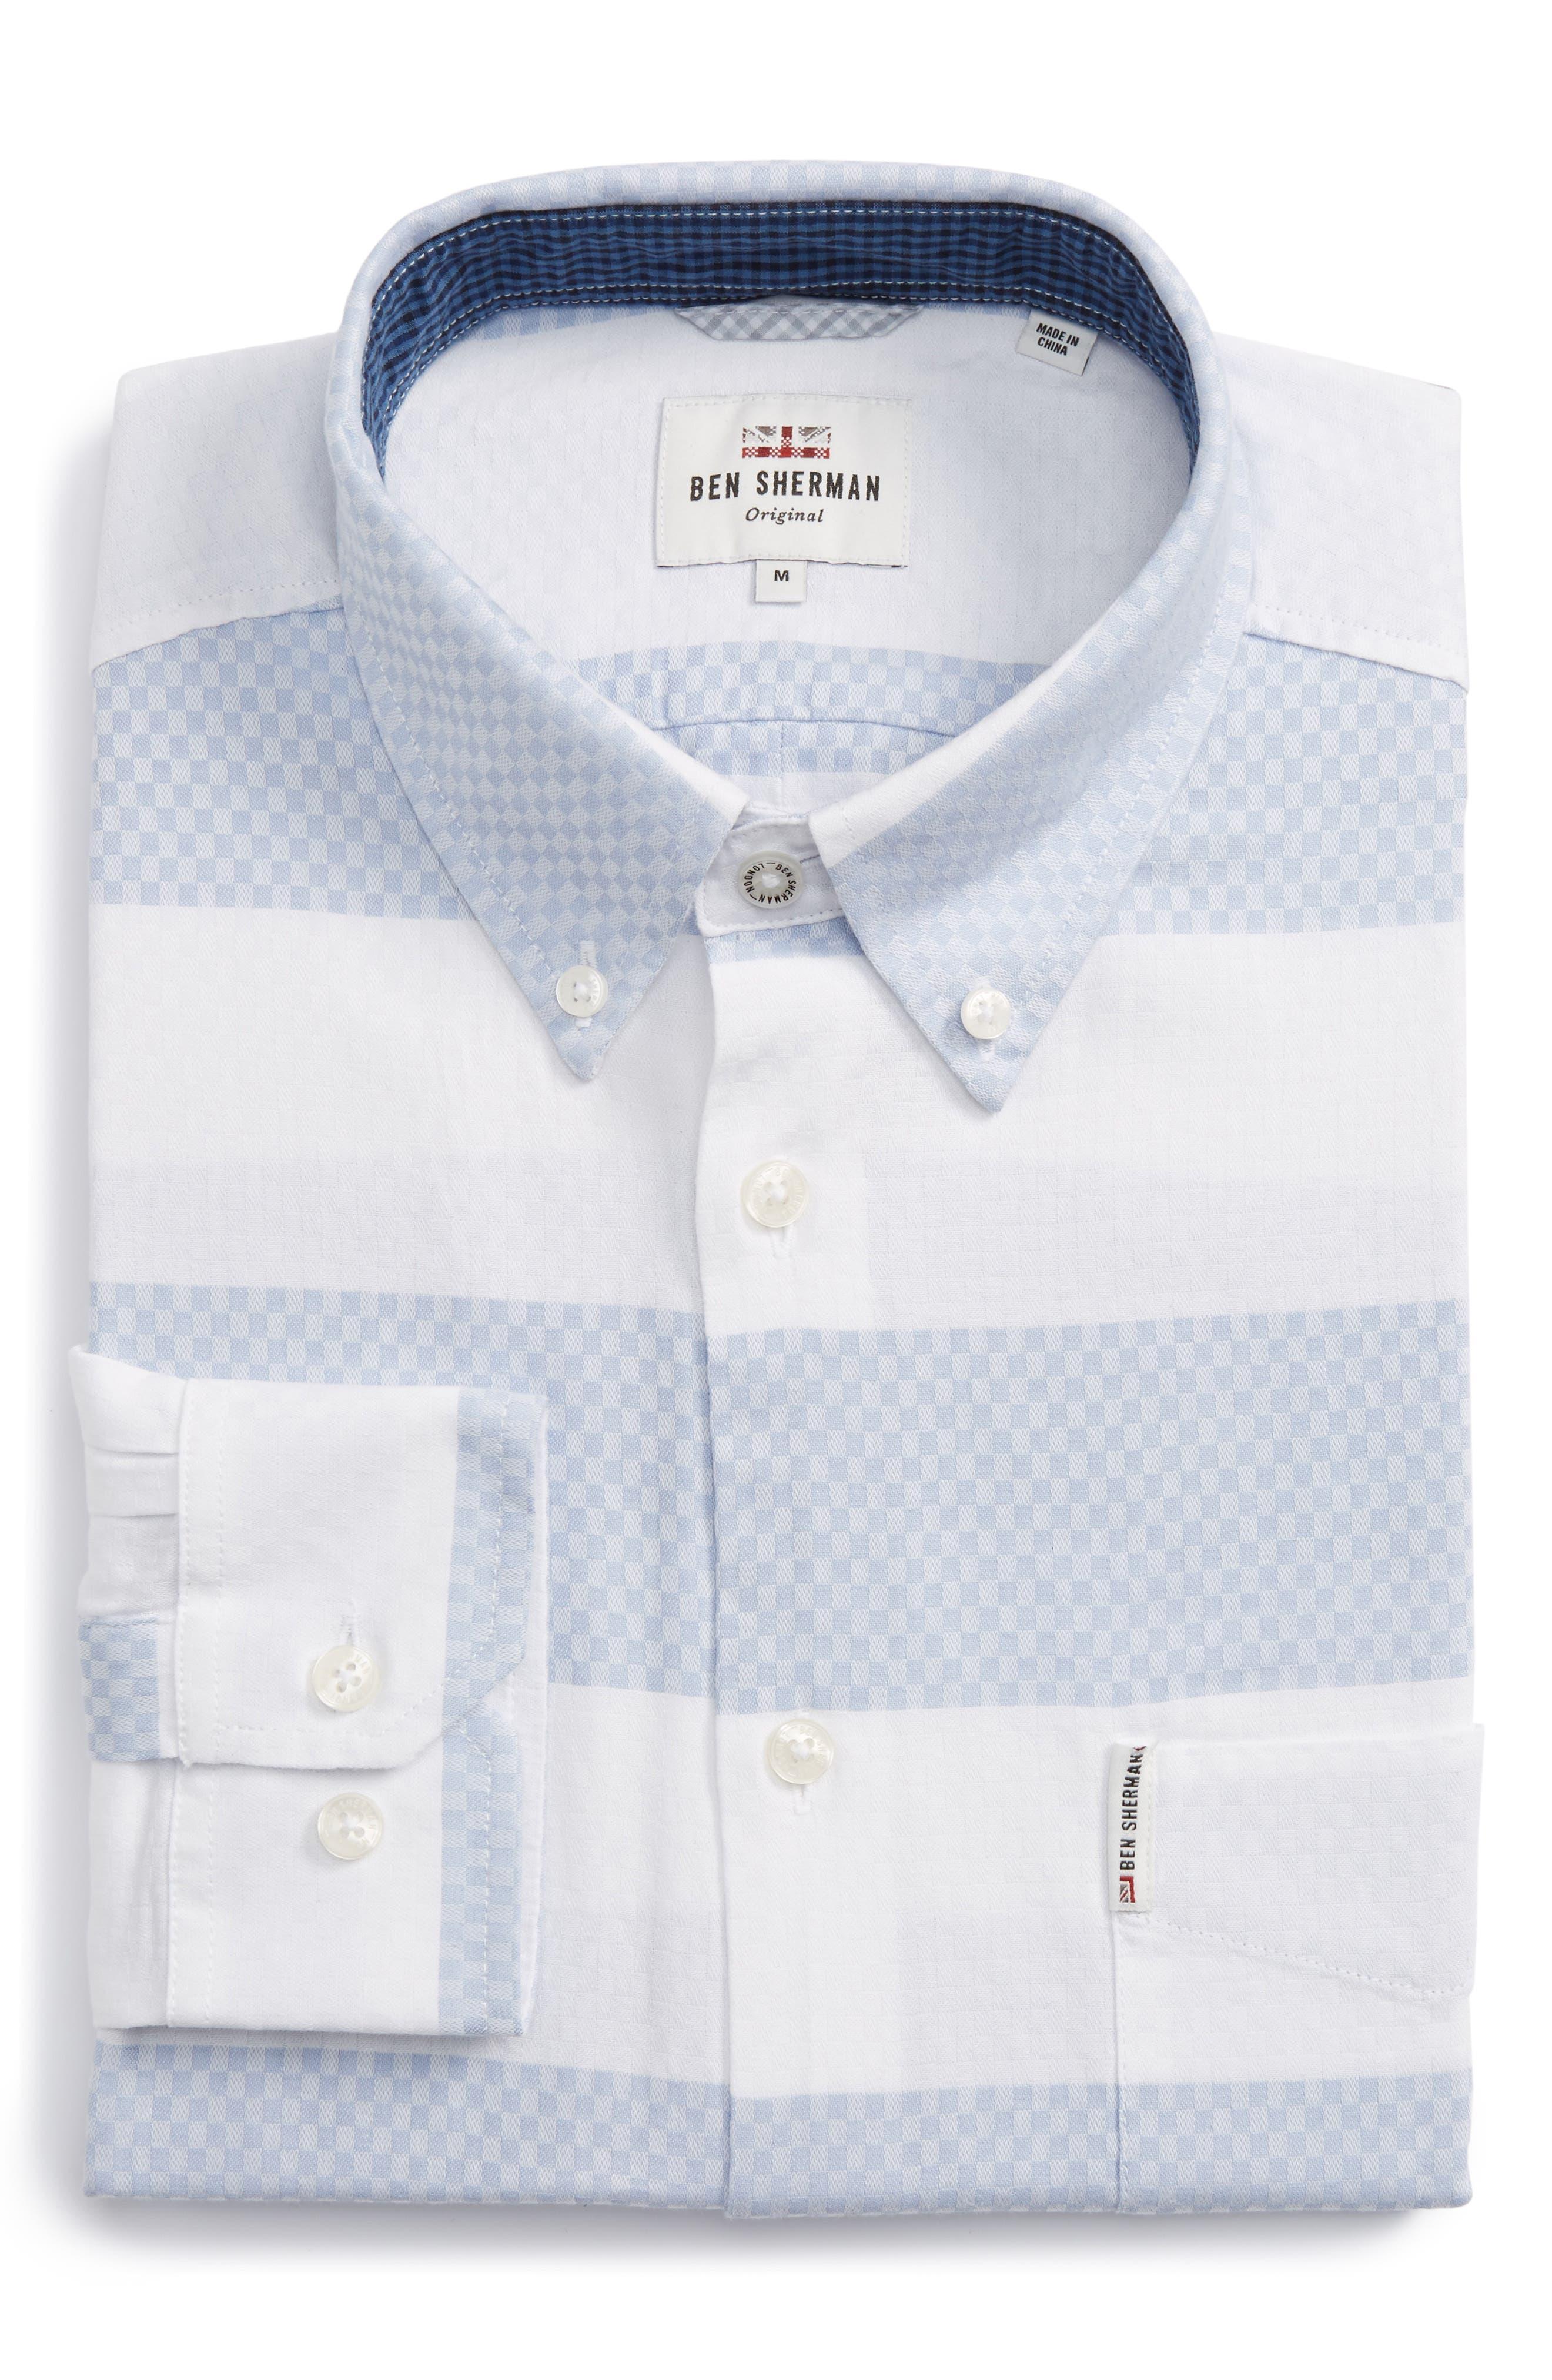 Main Image - Ben Sherman Dobby Gingham Stripes Shirt